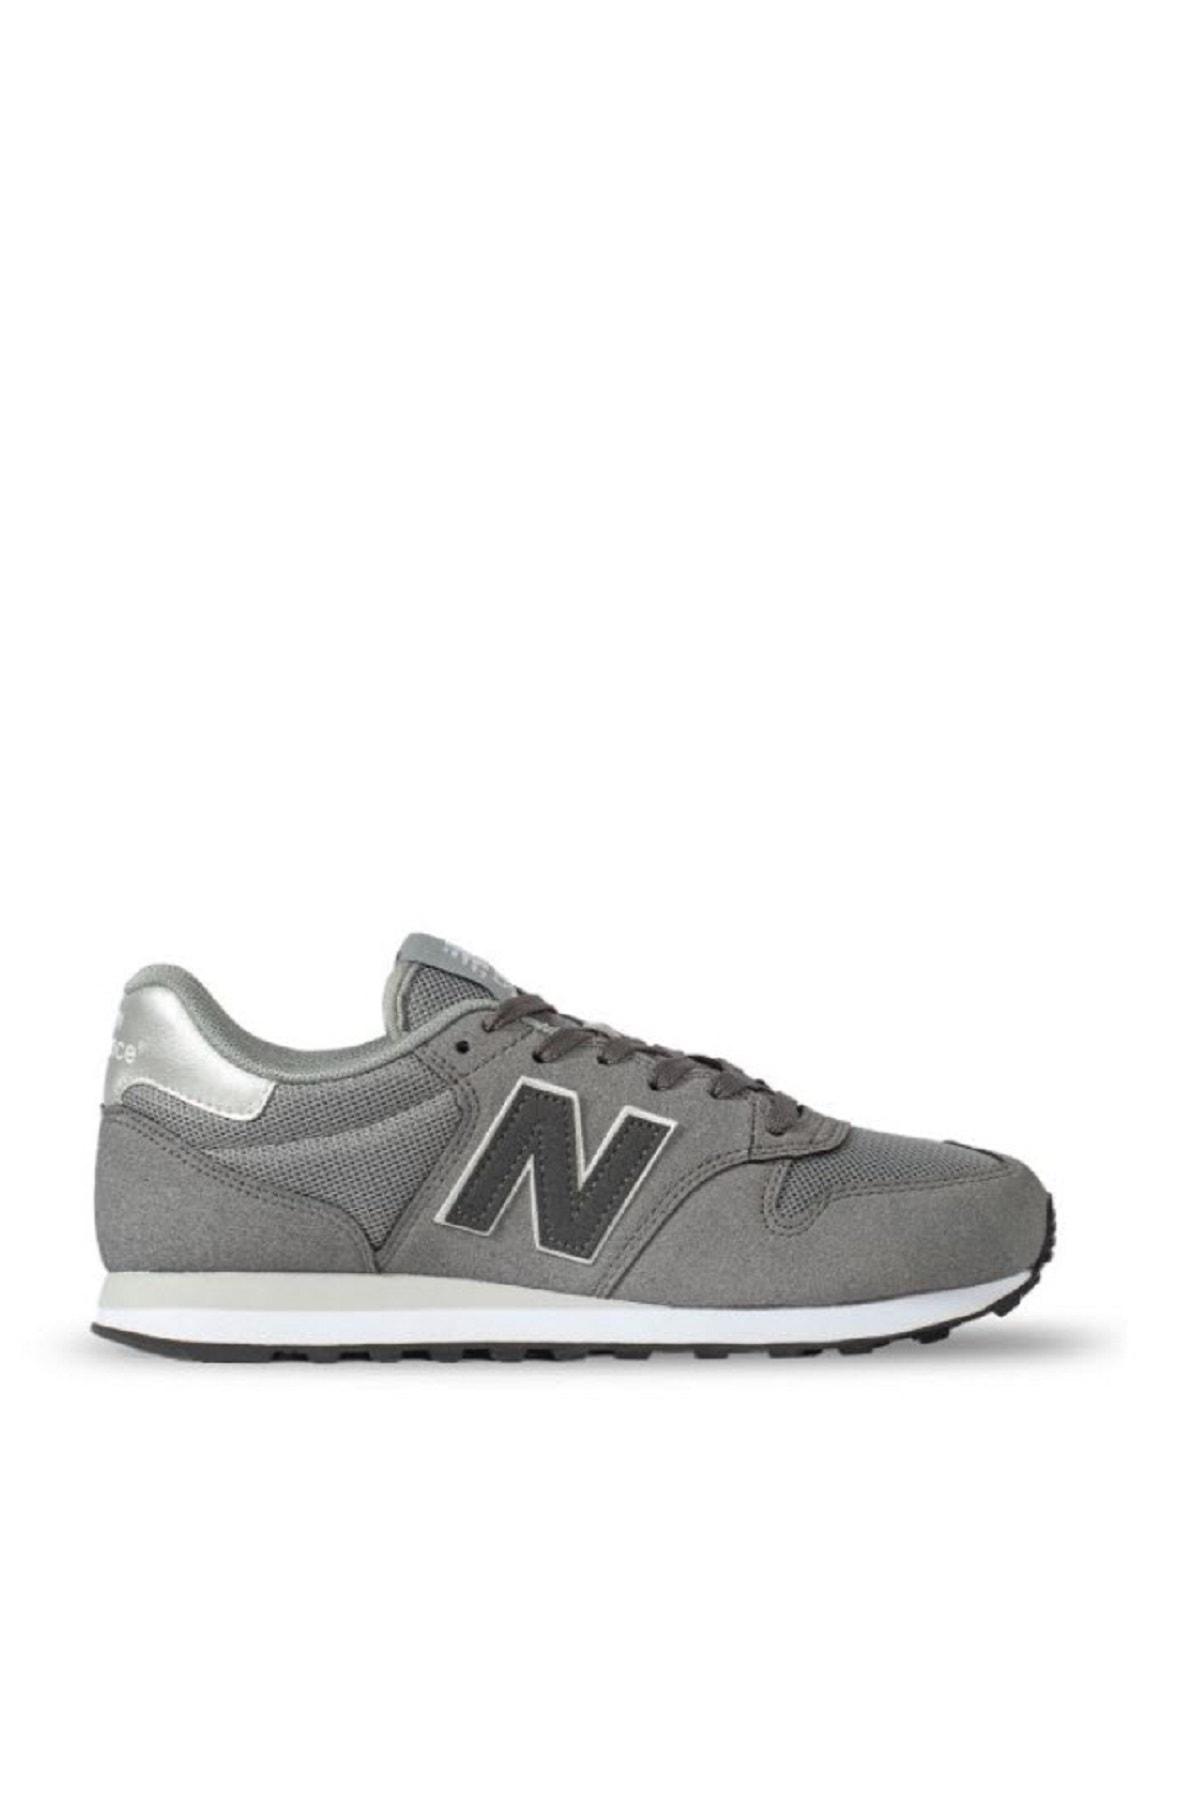 New Balance Kadın Sneaker - Lifestyle - GW500GGS 1